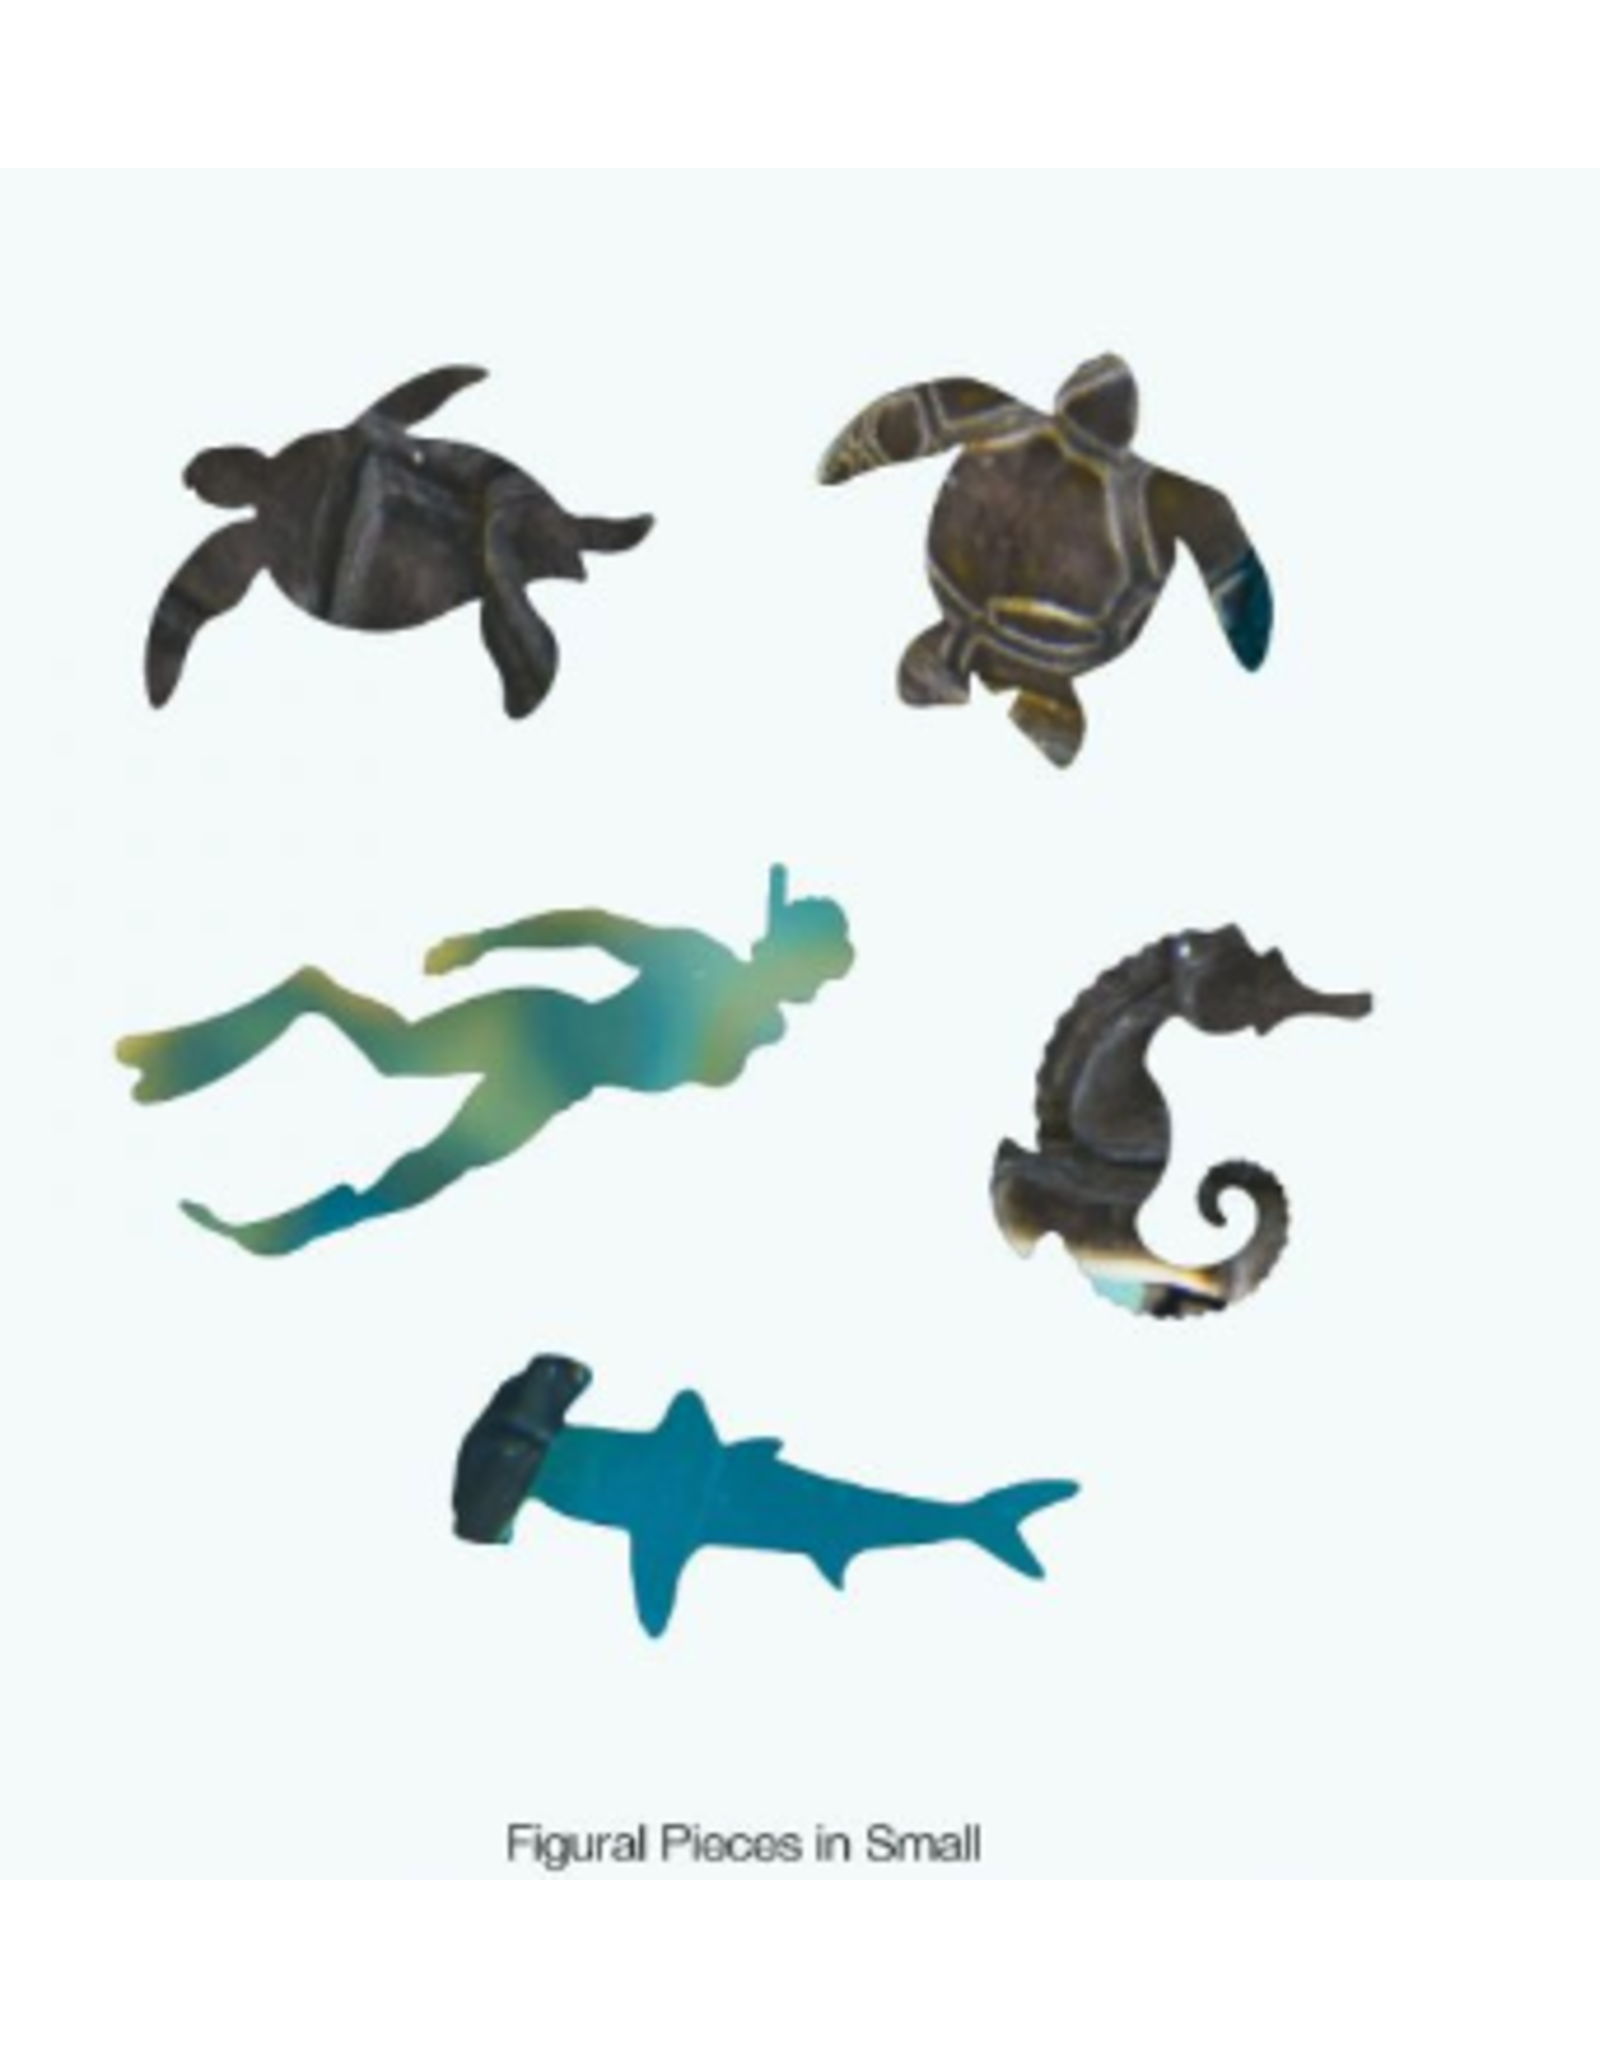 Zen Art & Design Mosaic Sea Turtle (Sm, 126 Pieces, Artisanal Wooden Jigsaw Puzzle)